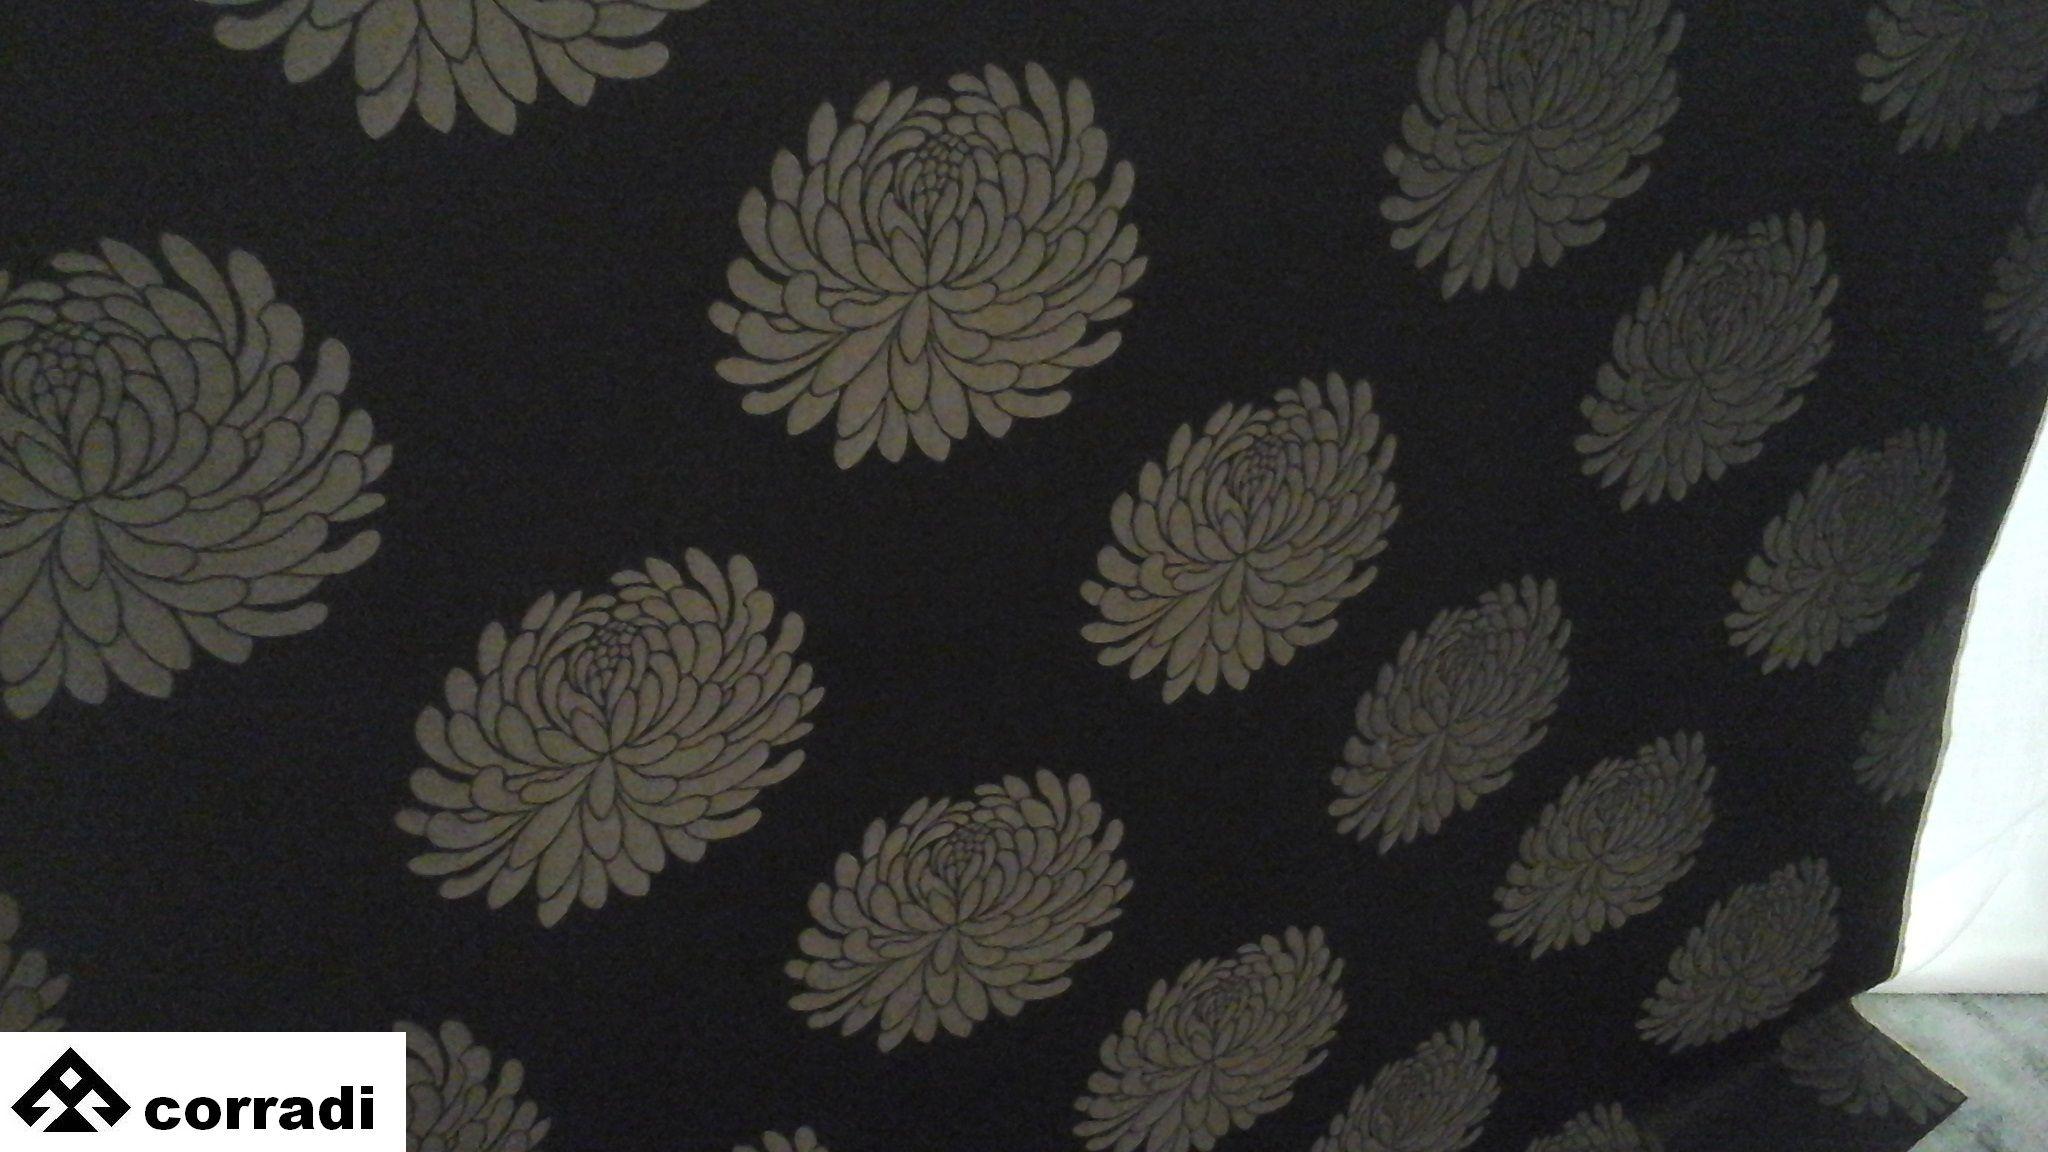 Home fabric for dècor by Romo 55% cotton 45% rayon cm. 137 x 300 Color ebony Price € 220.00 #homefabric #hometextile #decor #romo